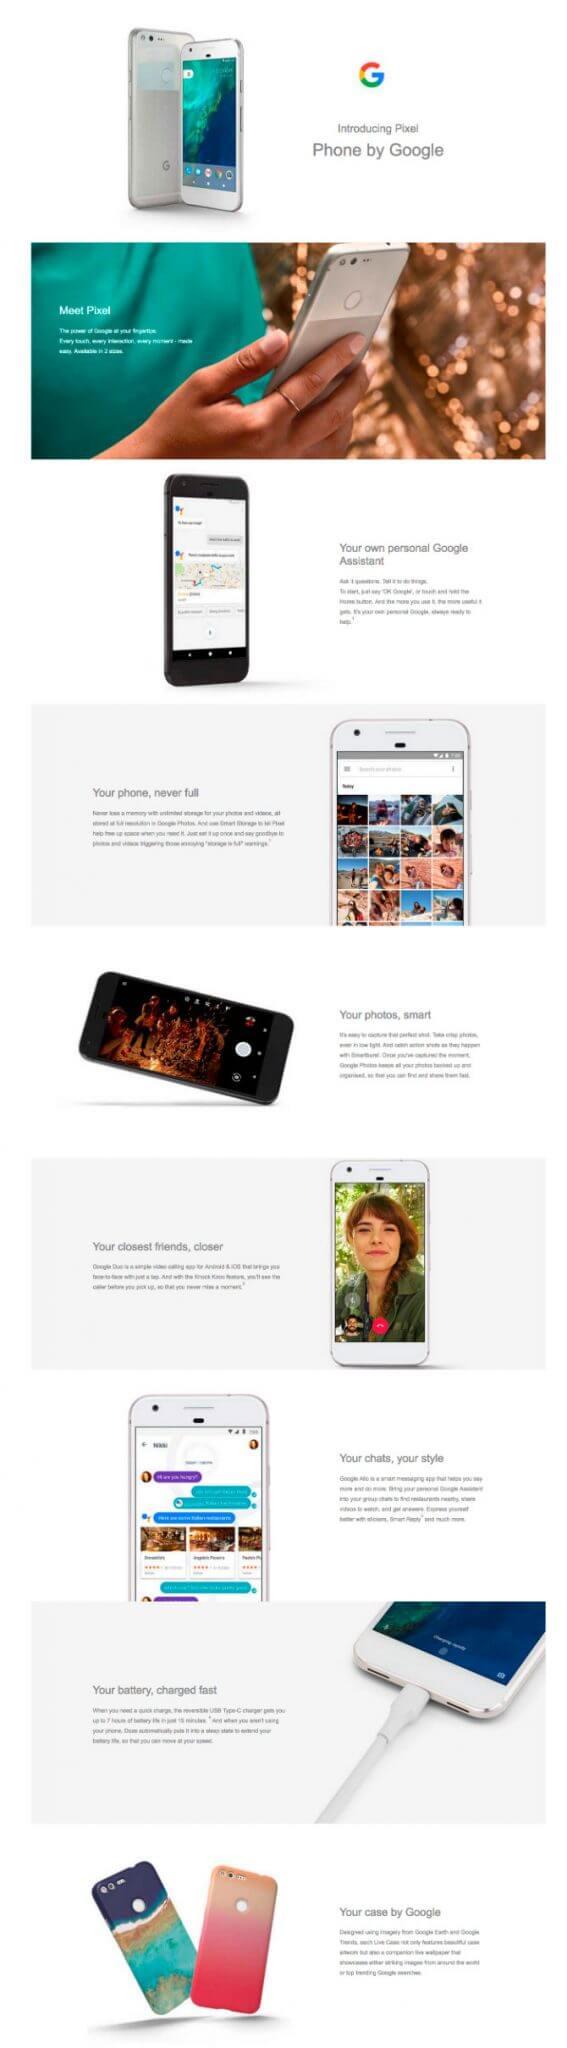 Print tela google píxel - Vazou tudo: confira todos os detalhes do Google Pixel e Pixel XL